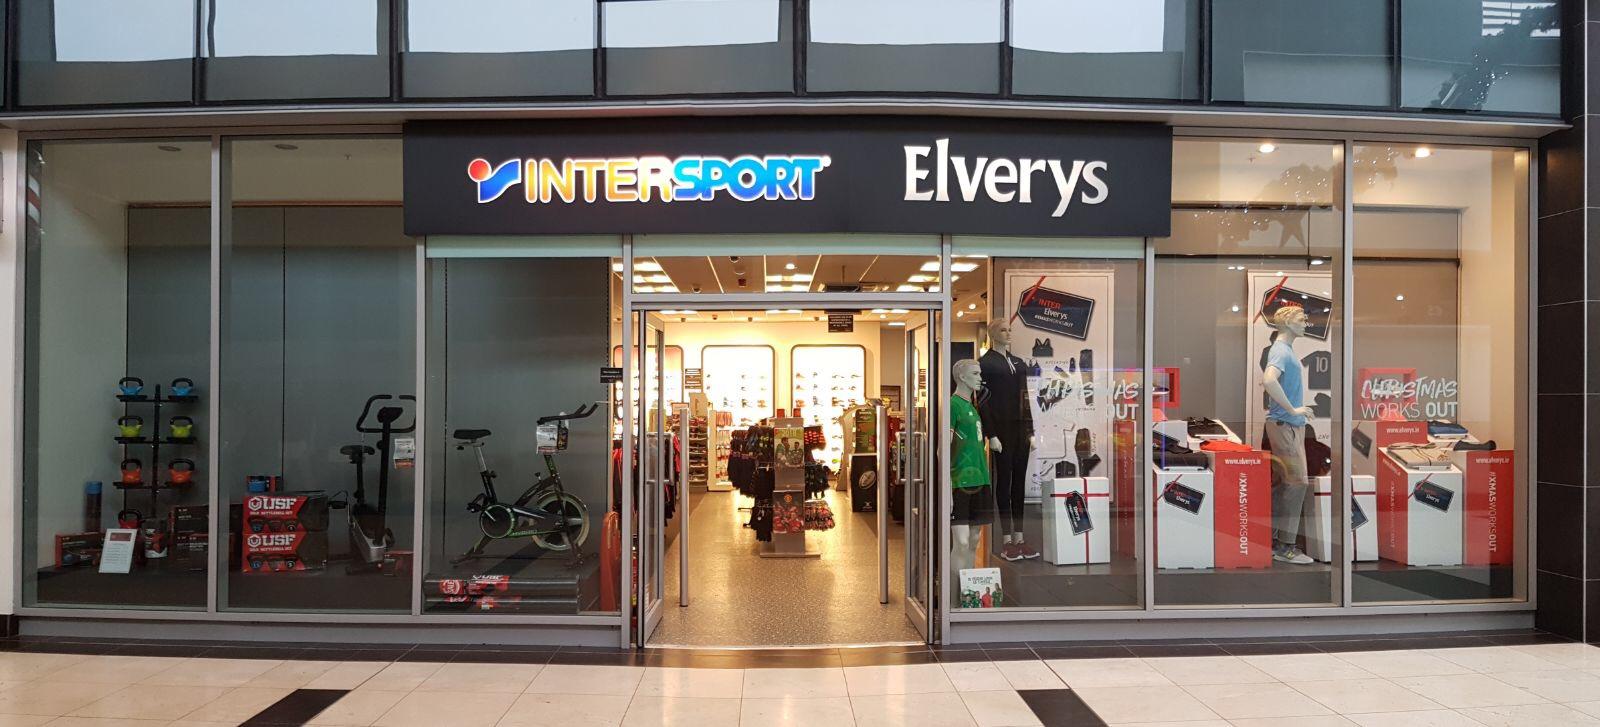 Unit 10 Elverys.JPG